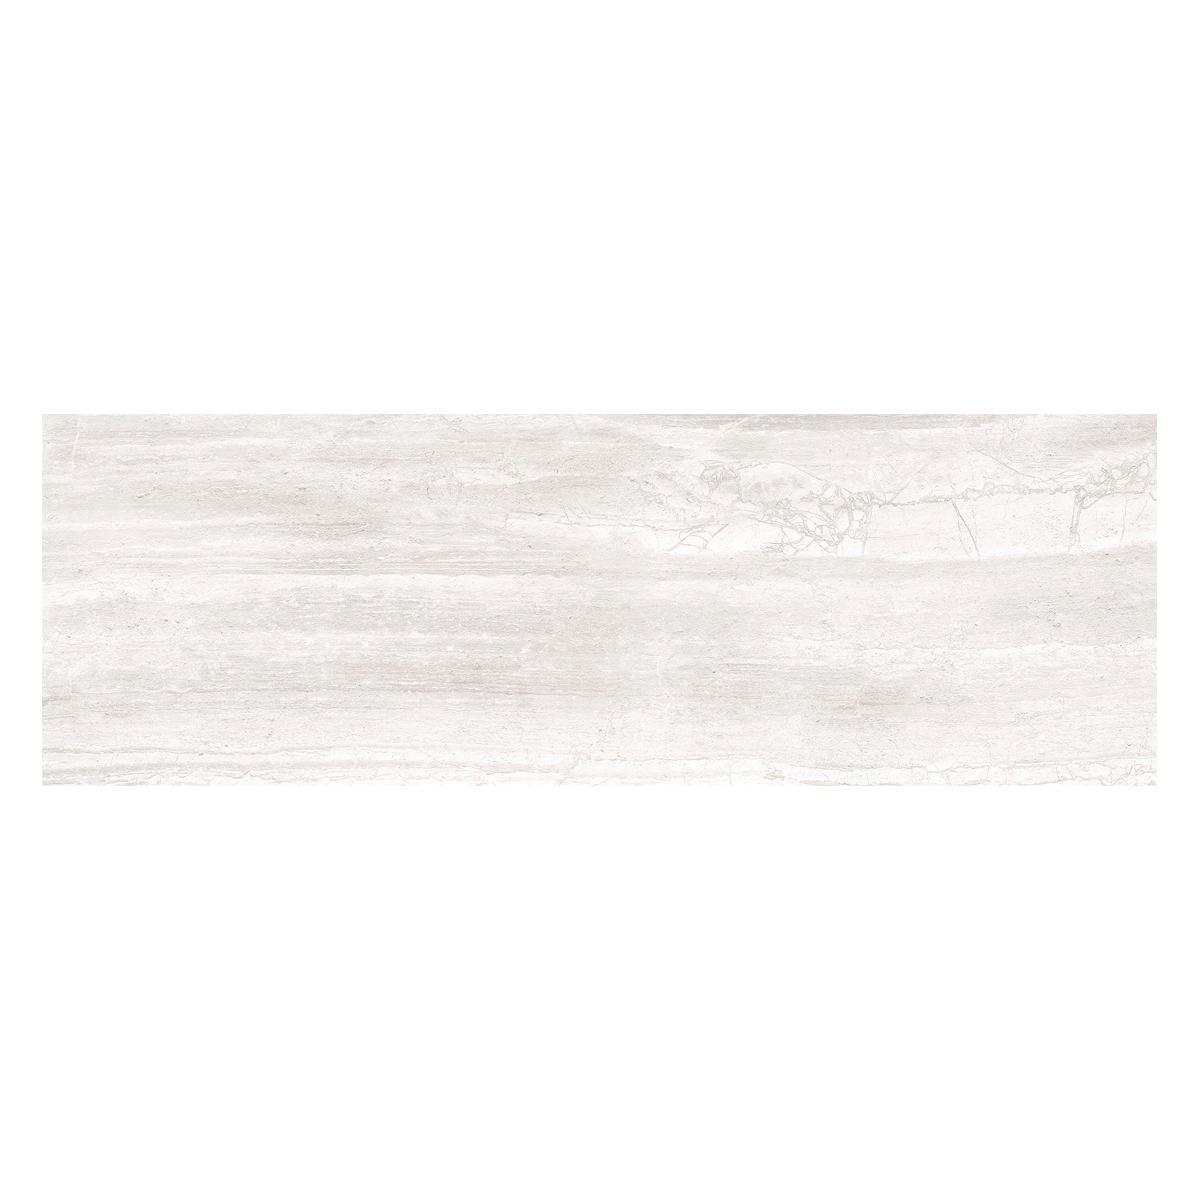 Mayólica Luxury Blanco Mate - 30X90 cm - 1.08 m2